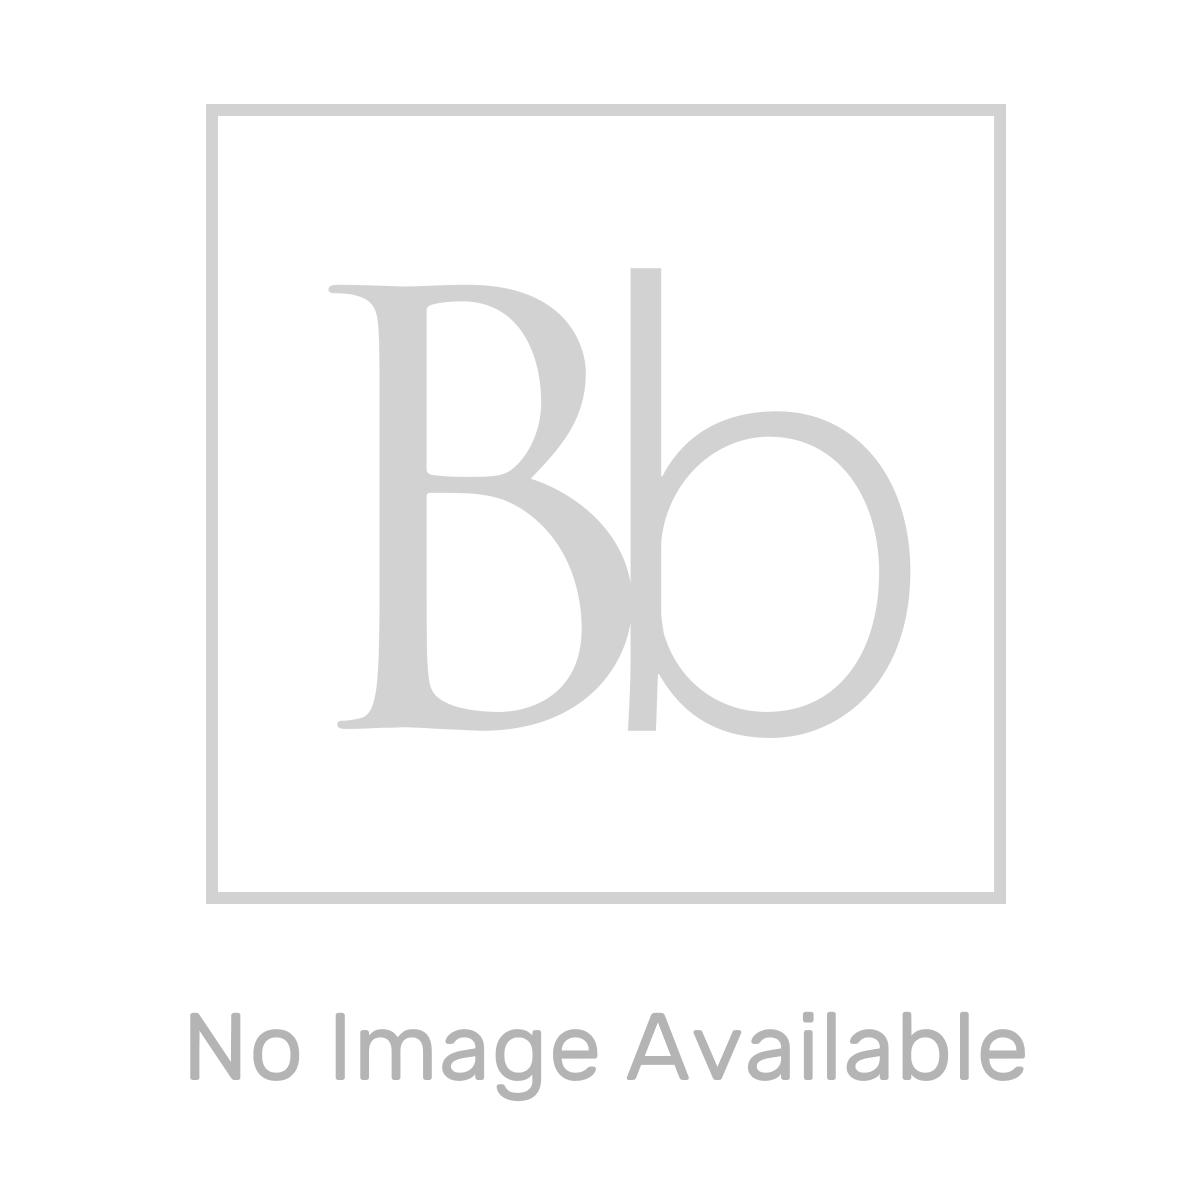 Premier High Gloss White Bathroom Mirror Cabinet Light On